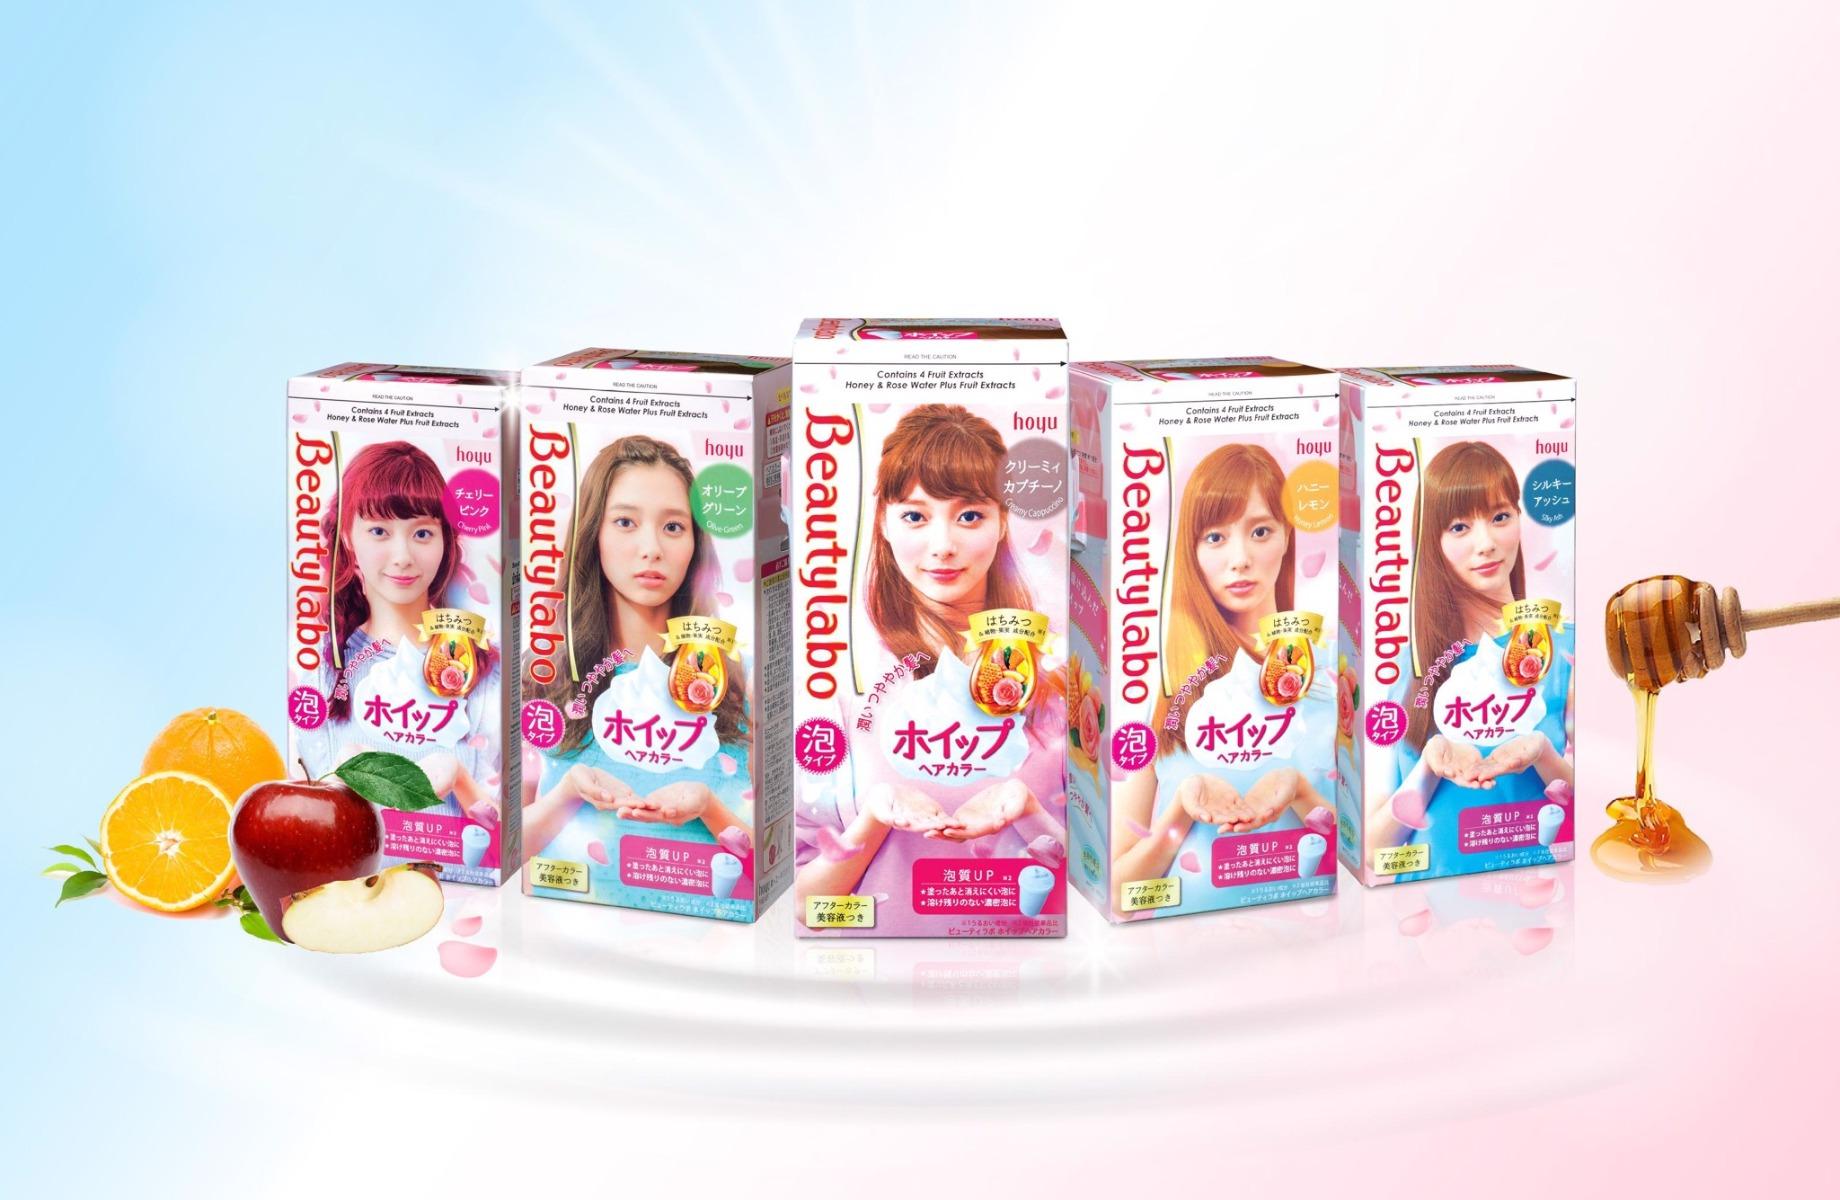 Kem Nhuộm Tạo Bọt Beautylabo Màu Nâu Kem Cappuccino - Creamy Cappuccino  40ml   Hasaki.vn